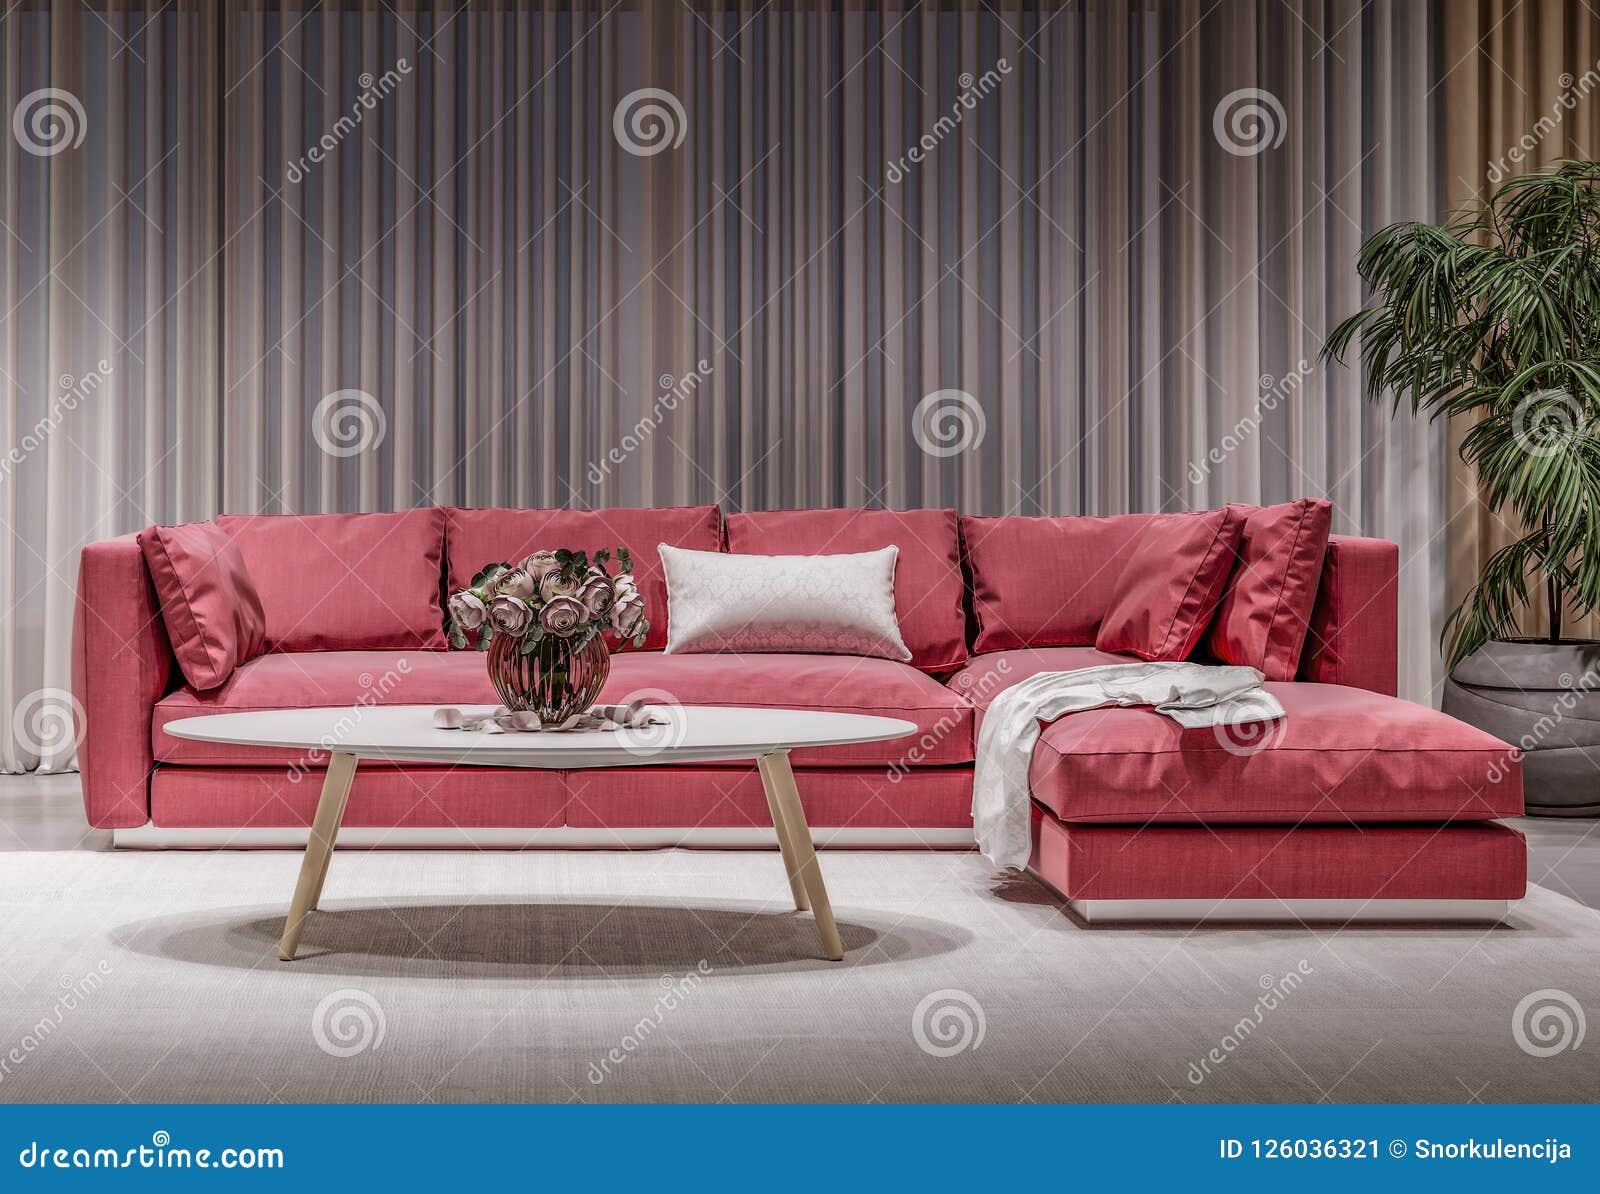 Modern design interior living room, red sofa